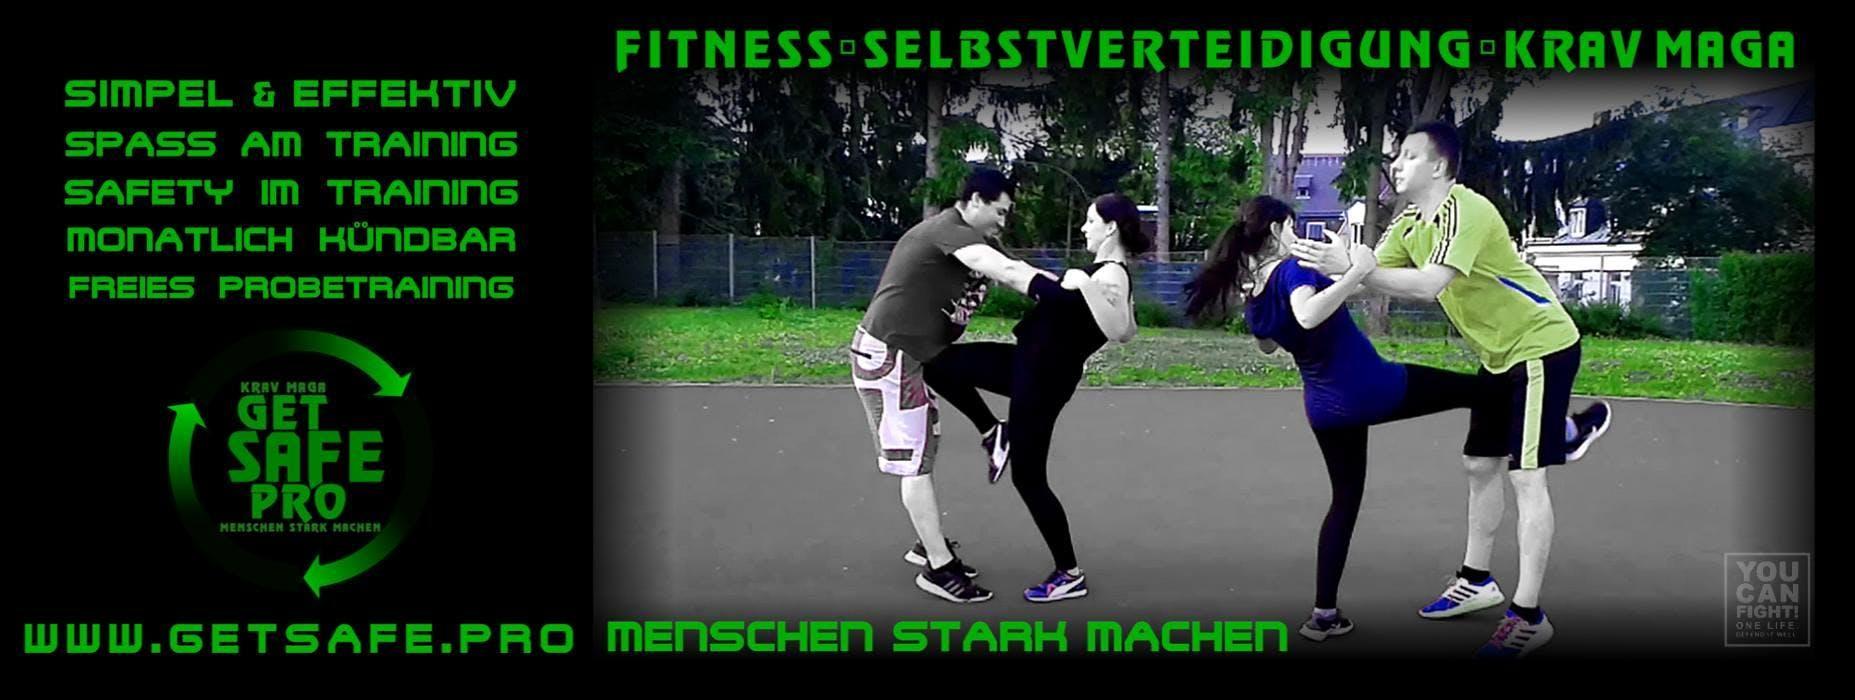 Fitness Selbstverteidigung Krav Maga in Mainz